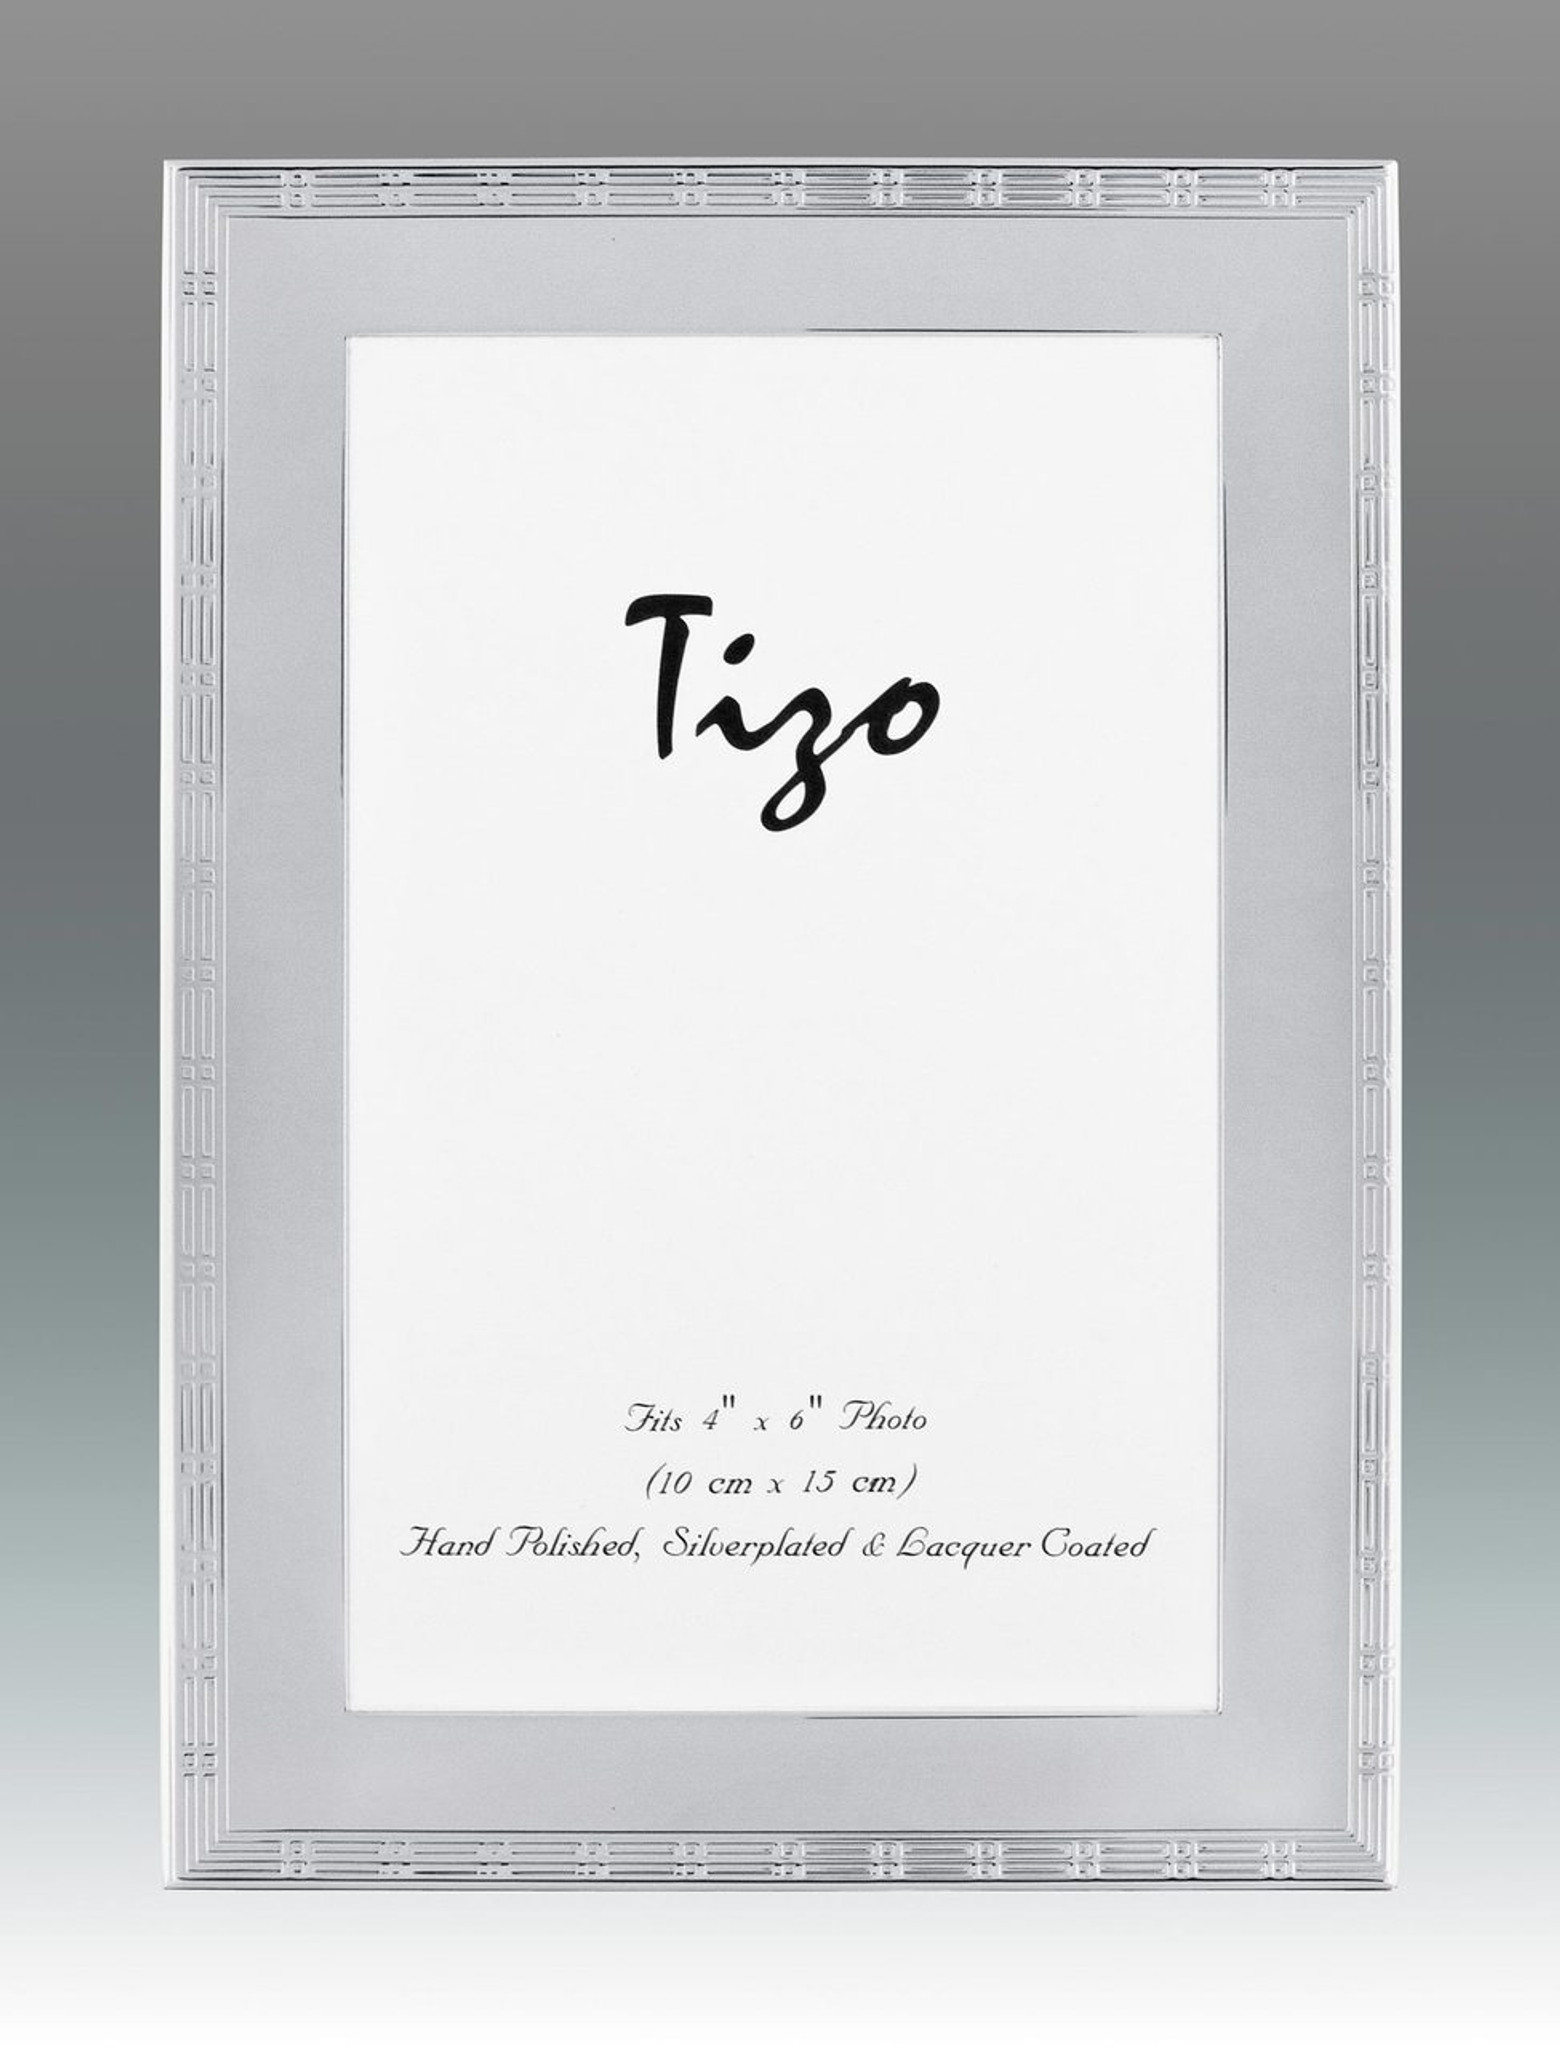 Tizo Thin Lines 8 X 10 Inch Silver Plated Picture Frame Homebello